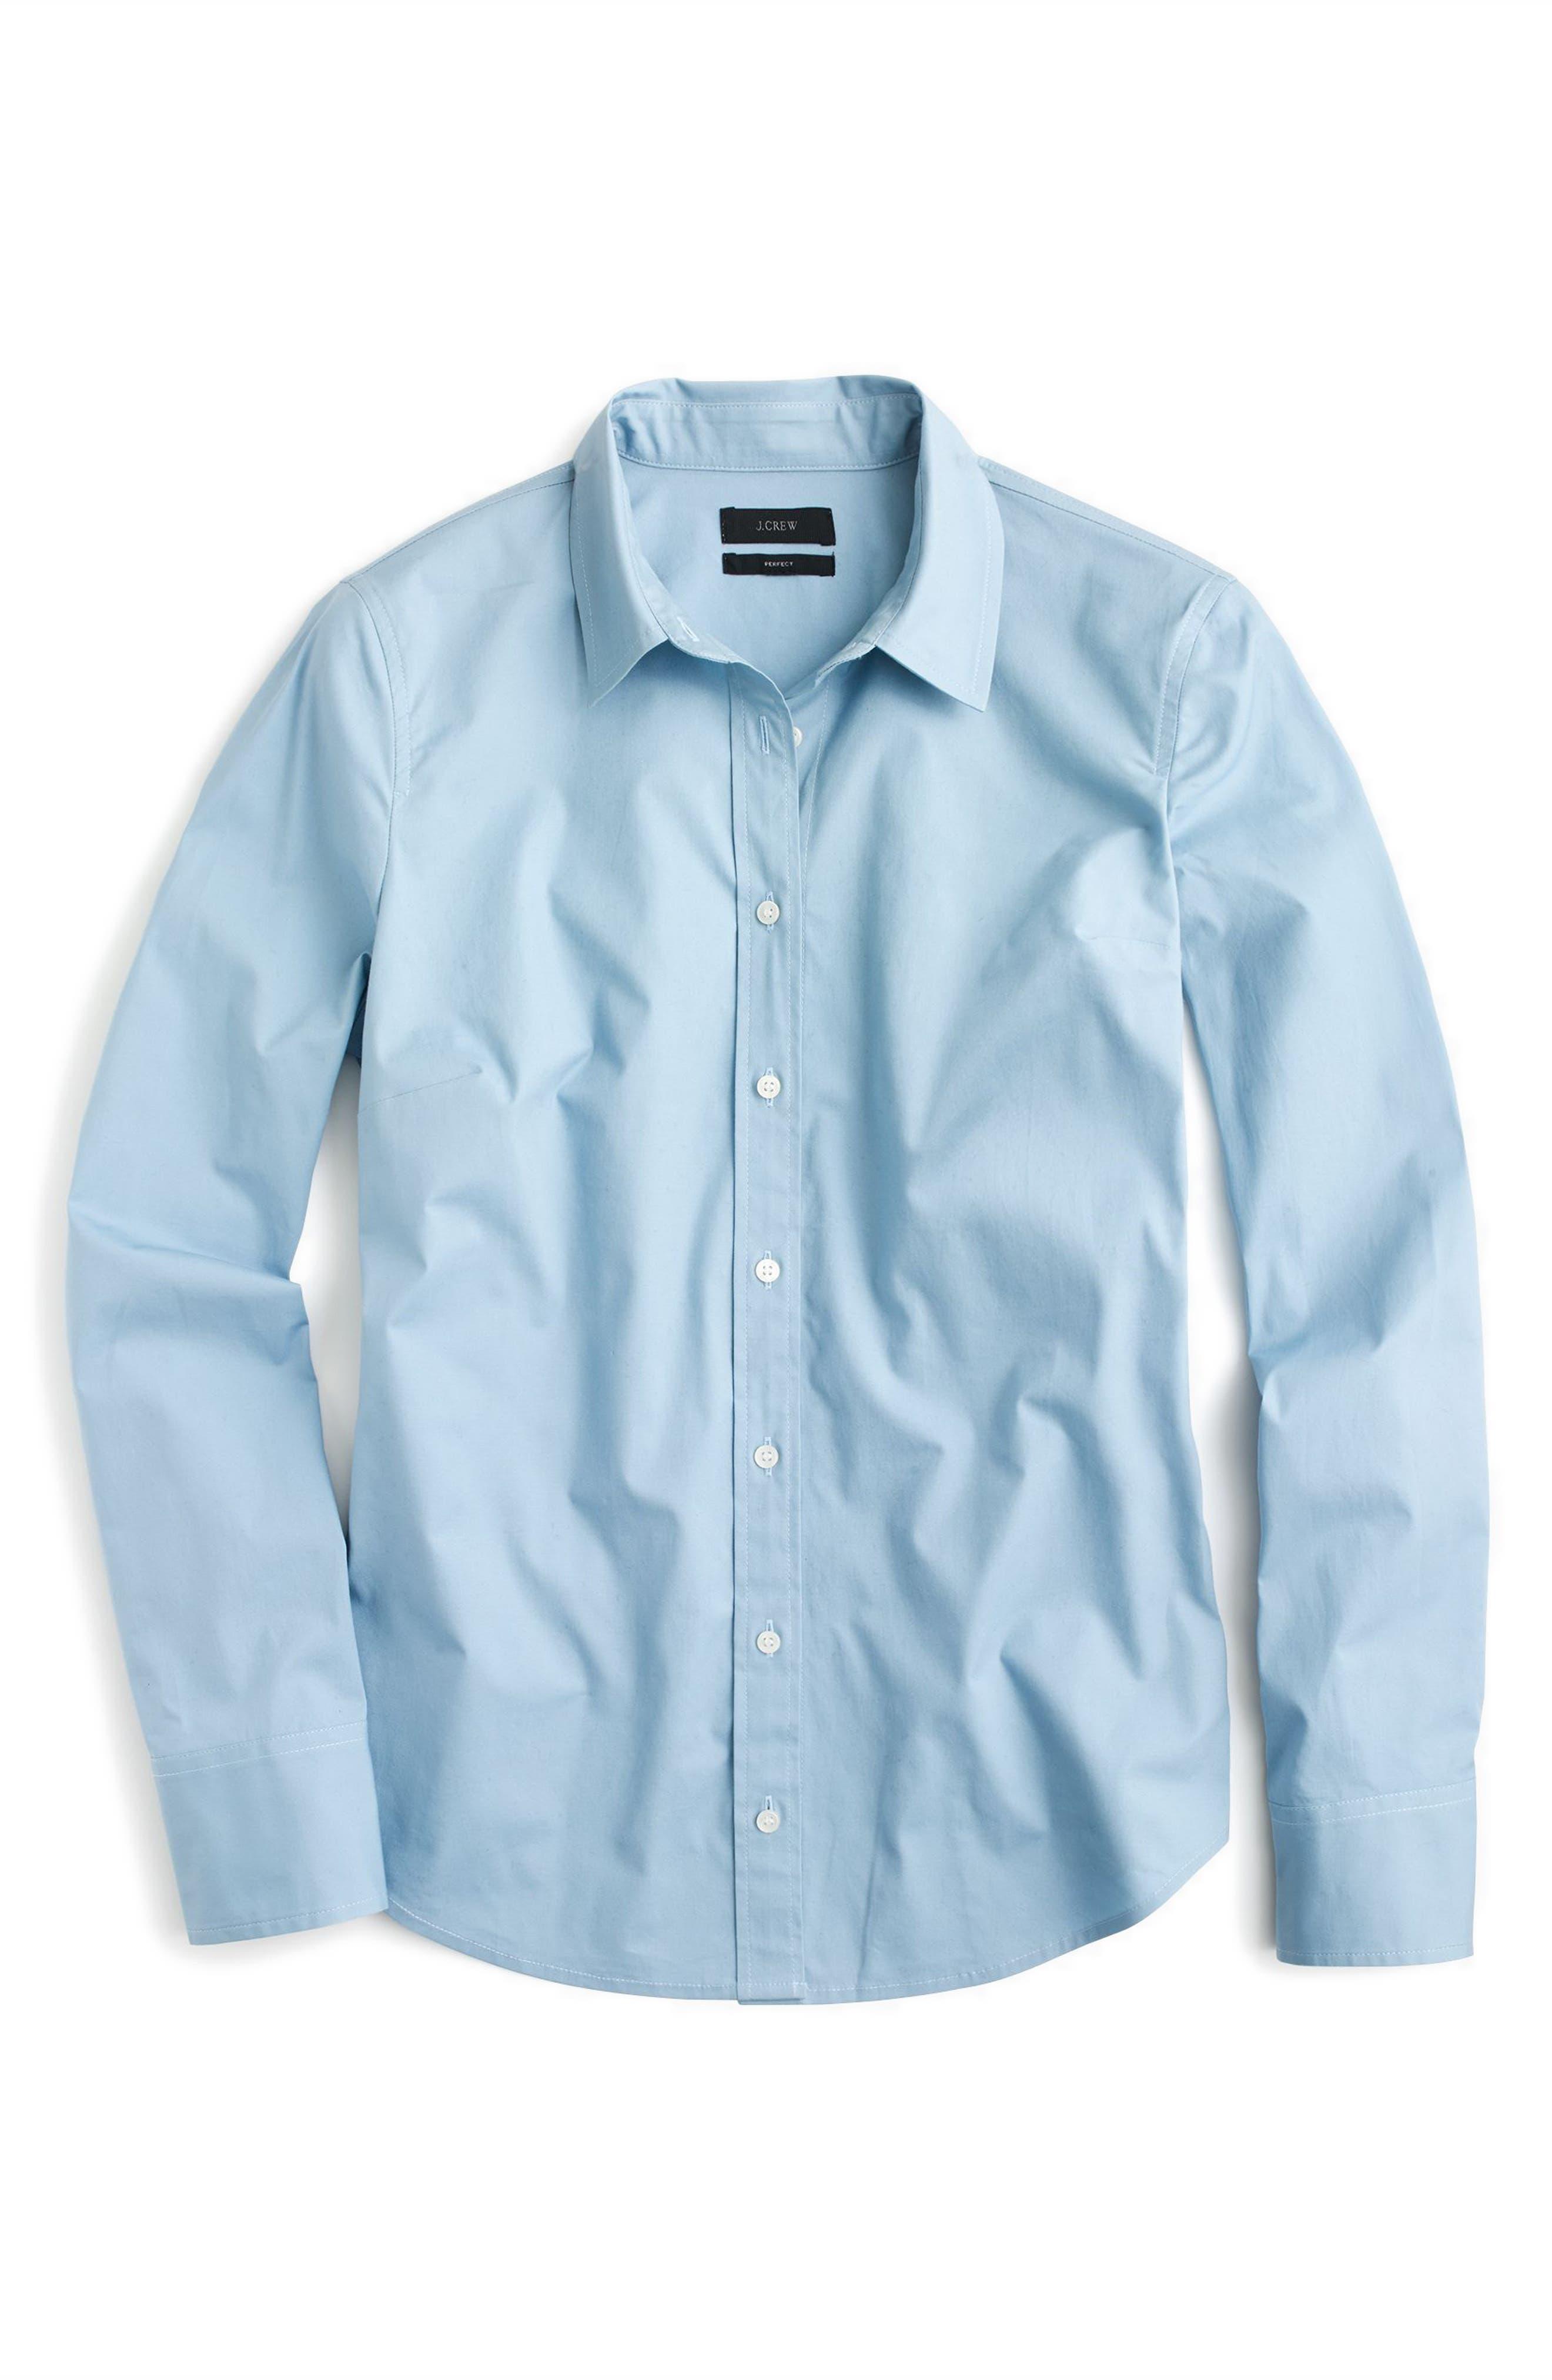 J.Crew Perfect Shirt,                             Alternate thumbnail 3, color,                             Misty Blue